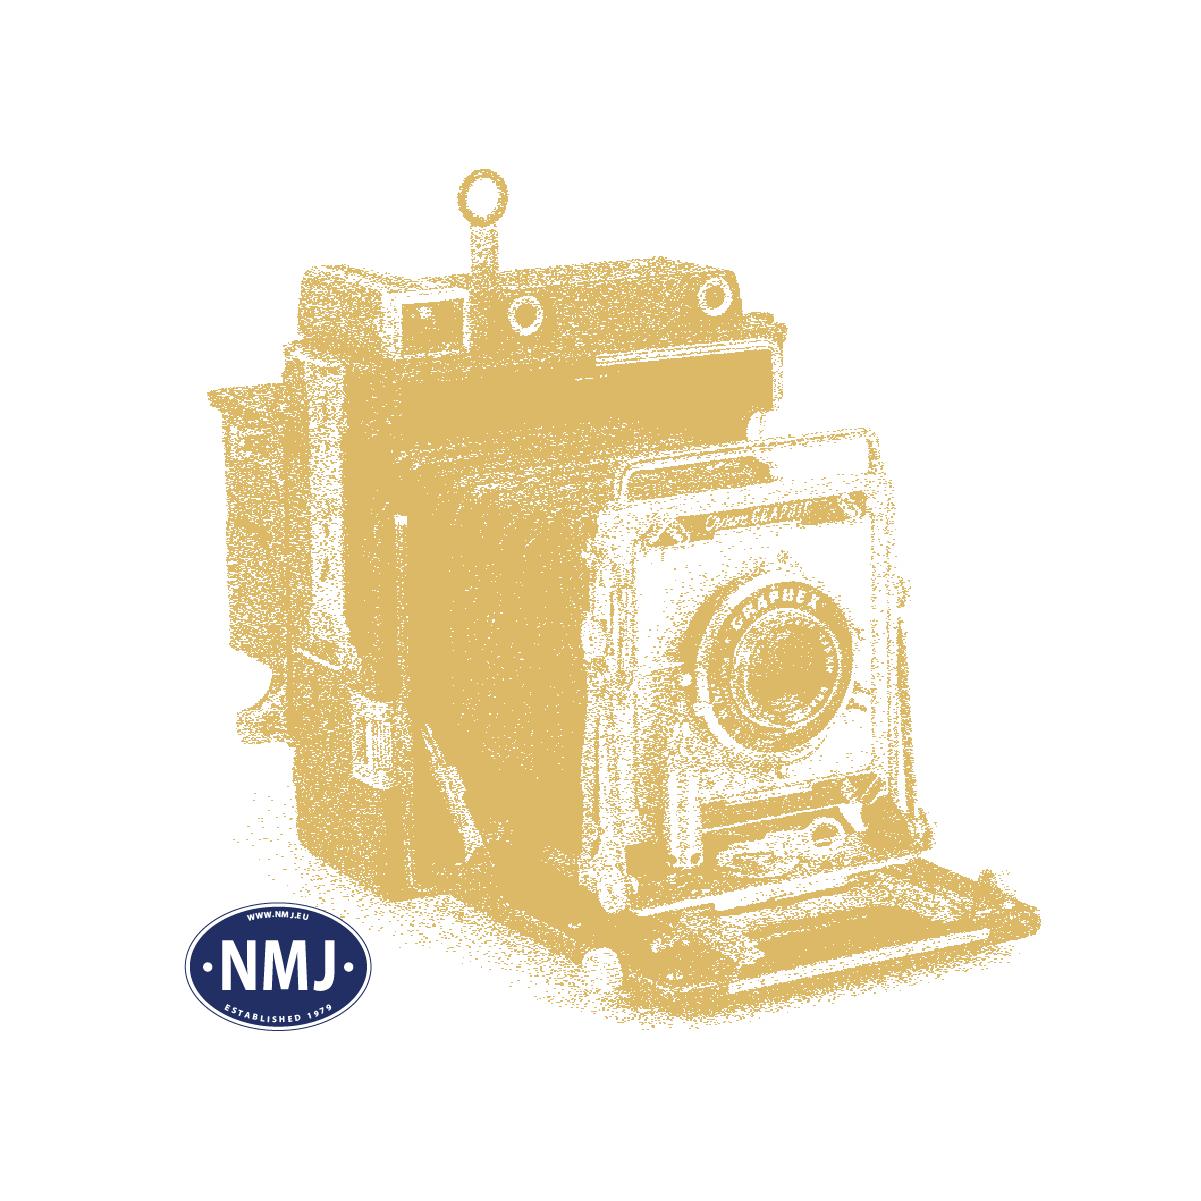 NMJT90403 - NMJ Topline SNCB 5404, DCC m/ SOUND